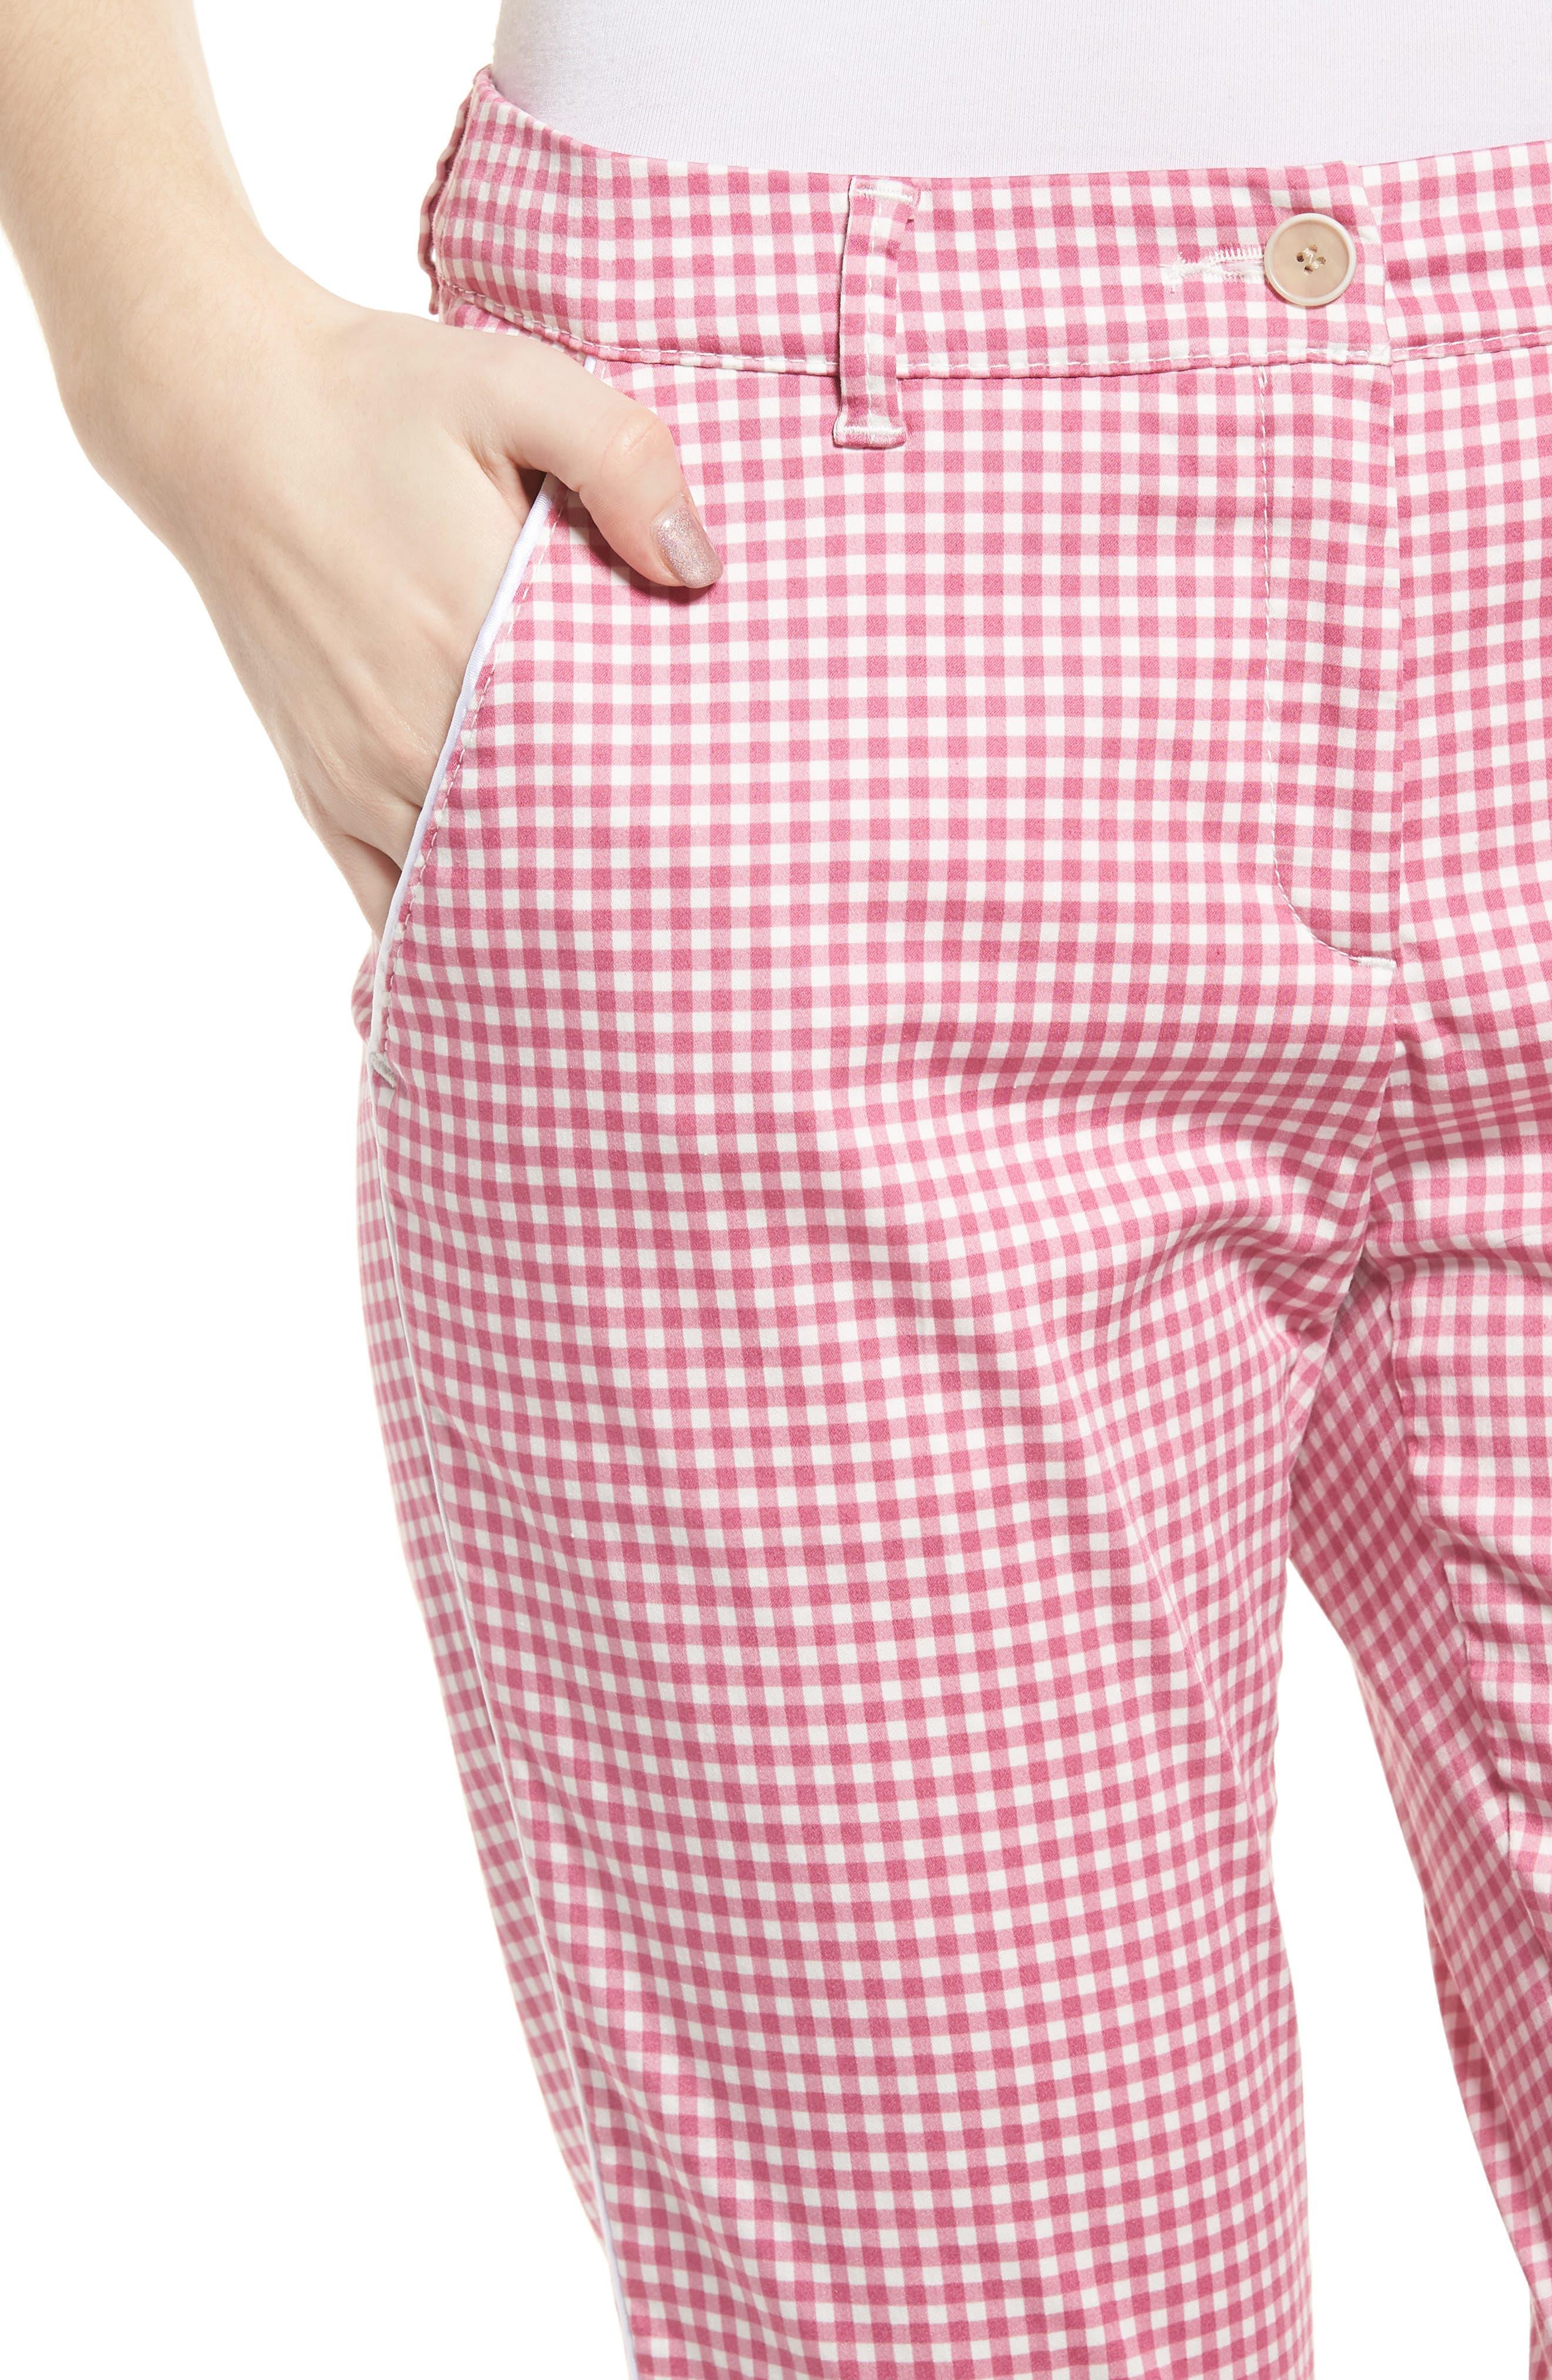 Maron Gingham Stretch Cotton Pants,                             Alternate thumbnail 4, color,                             Pink